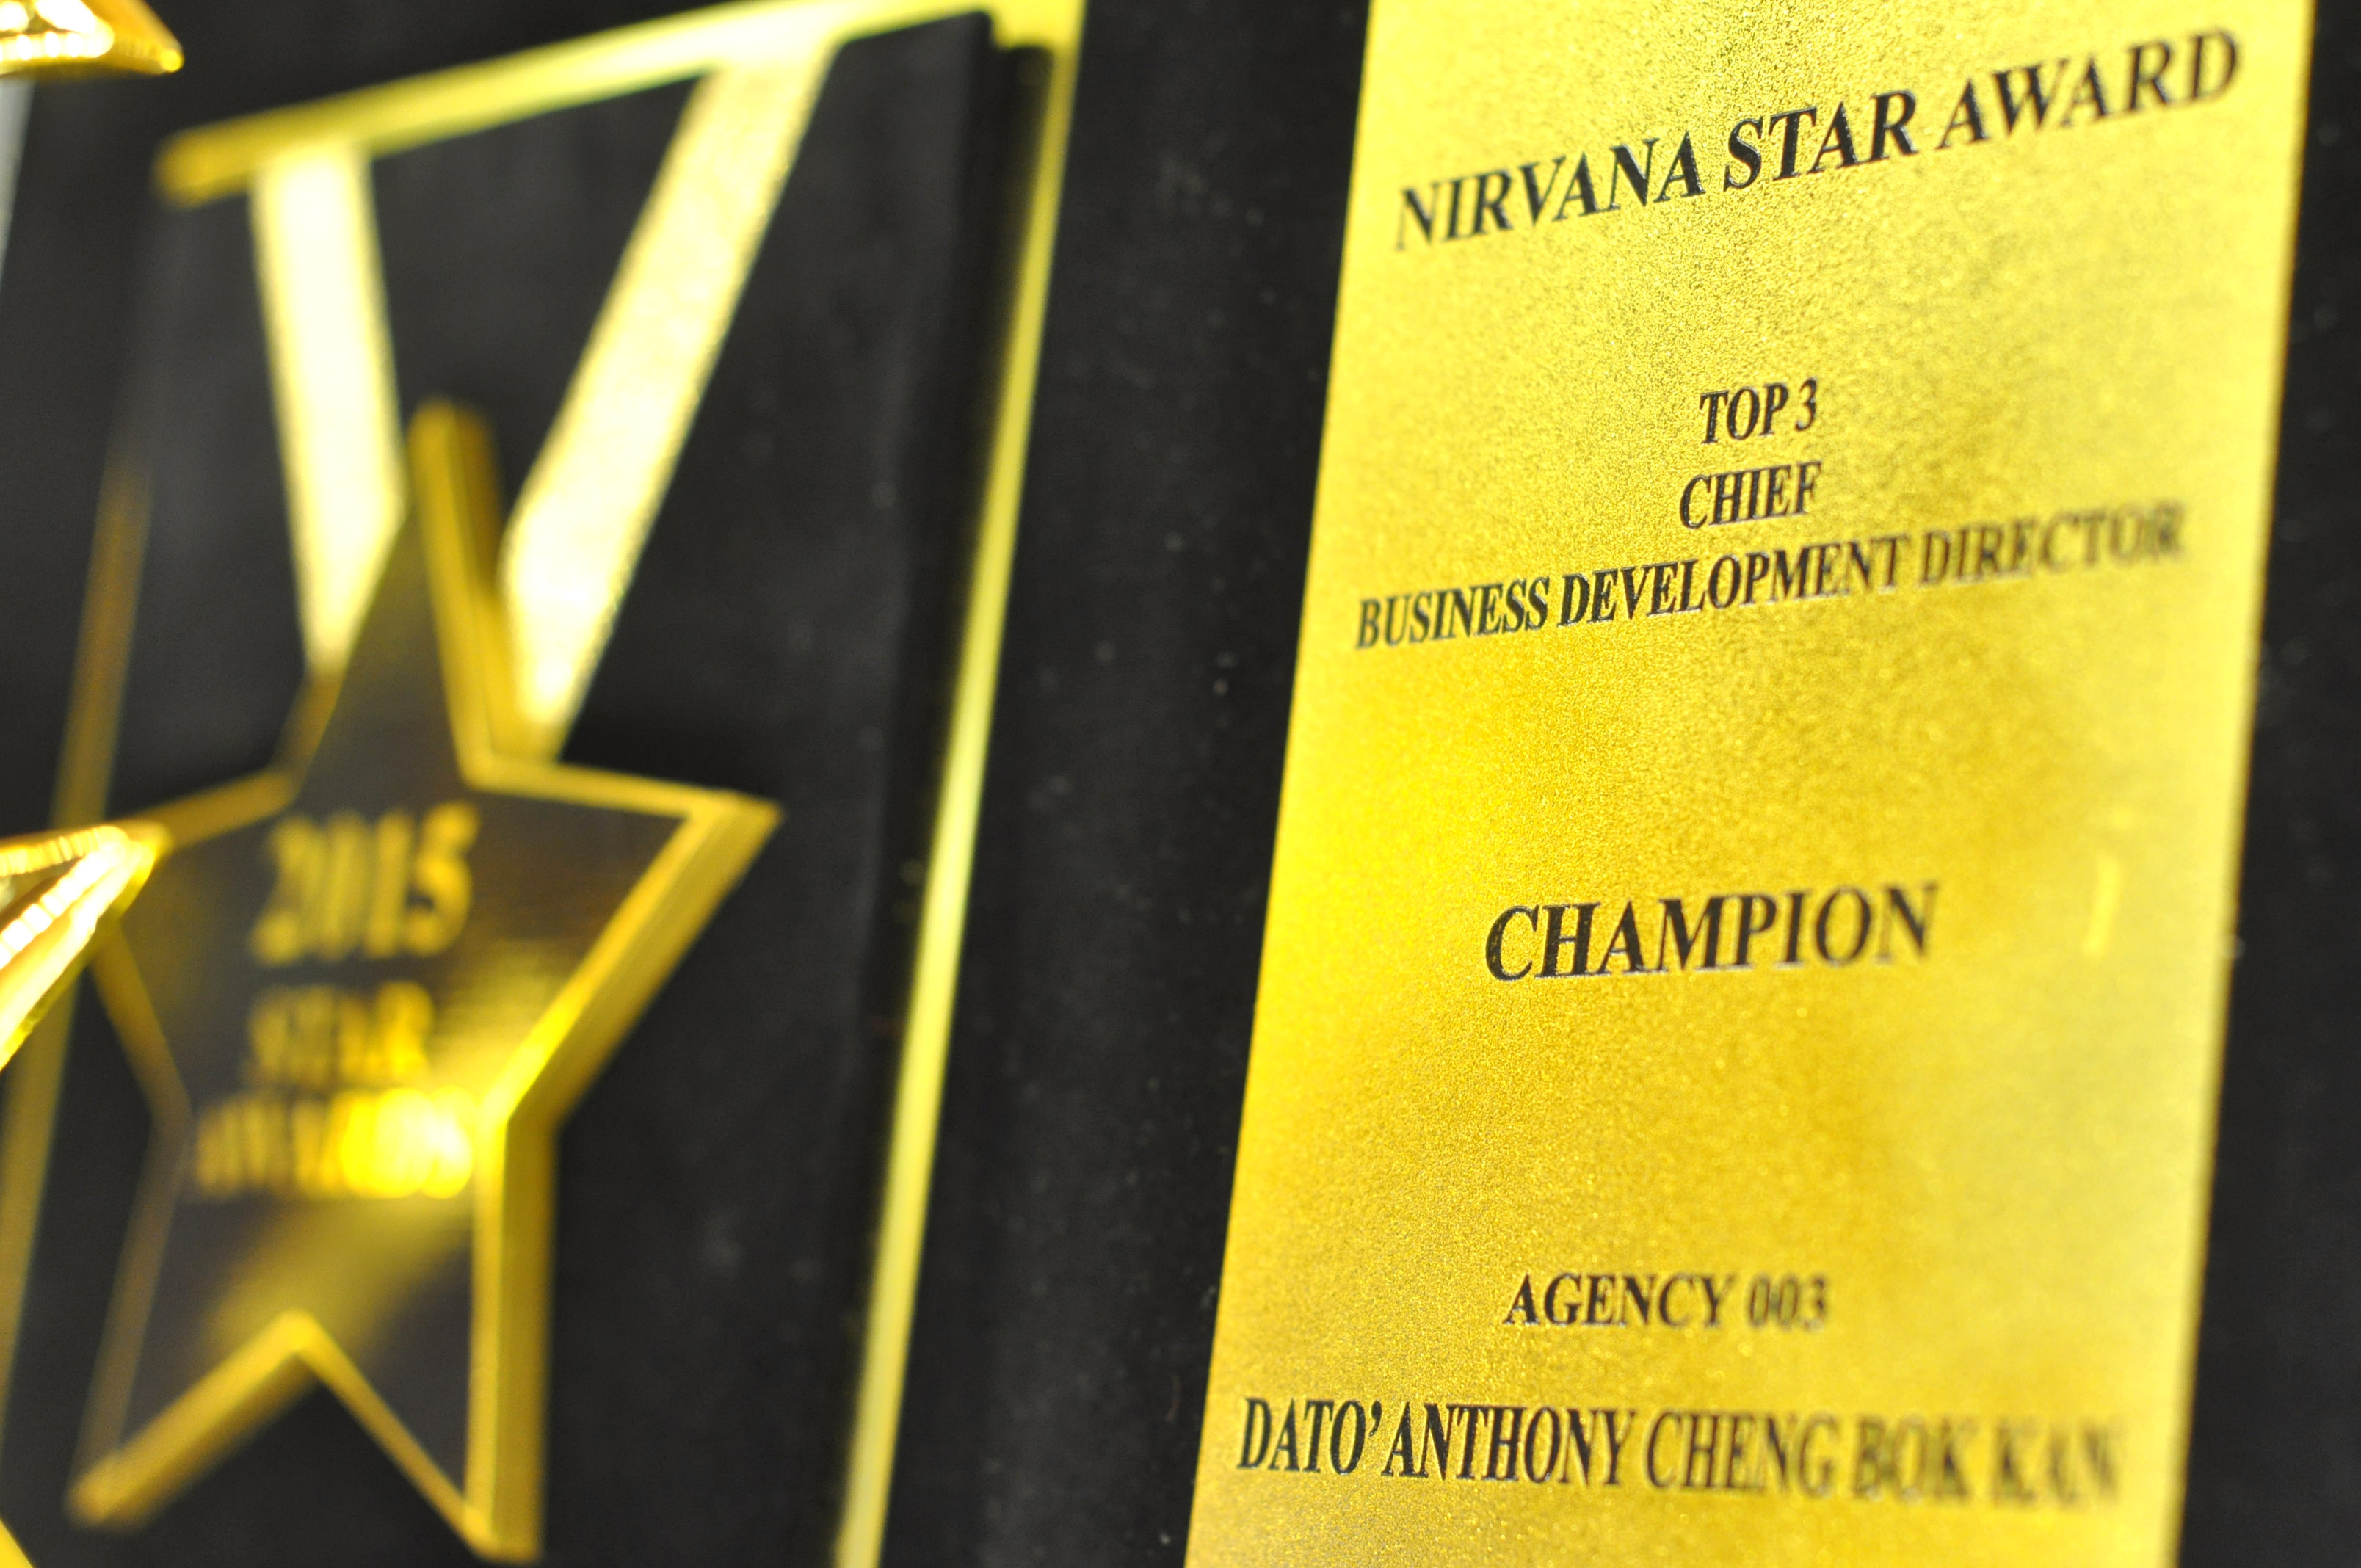 2015 Asia Champion